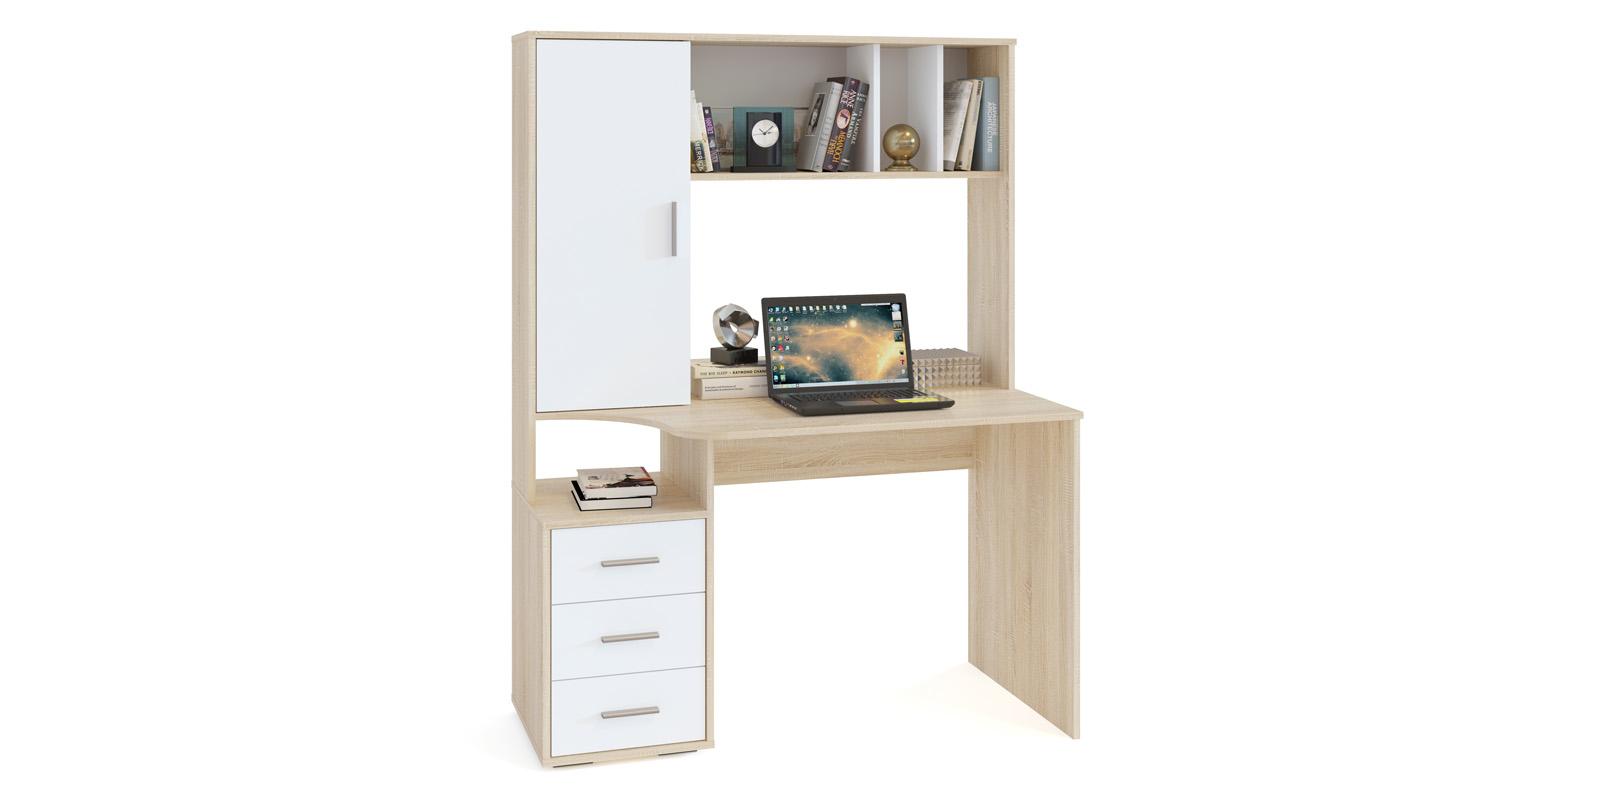 Стол компьютерный Мадлен (дуб сонома/белый)